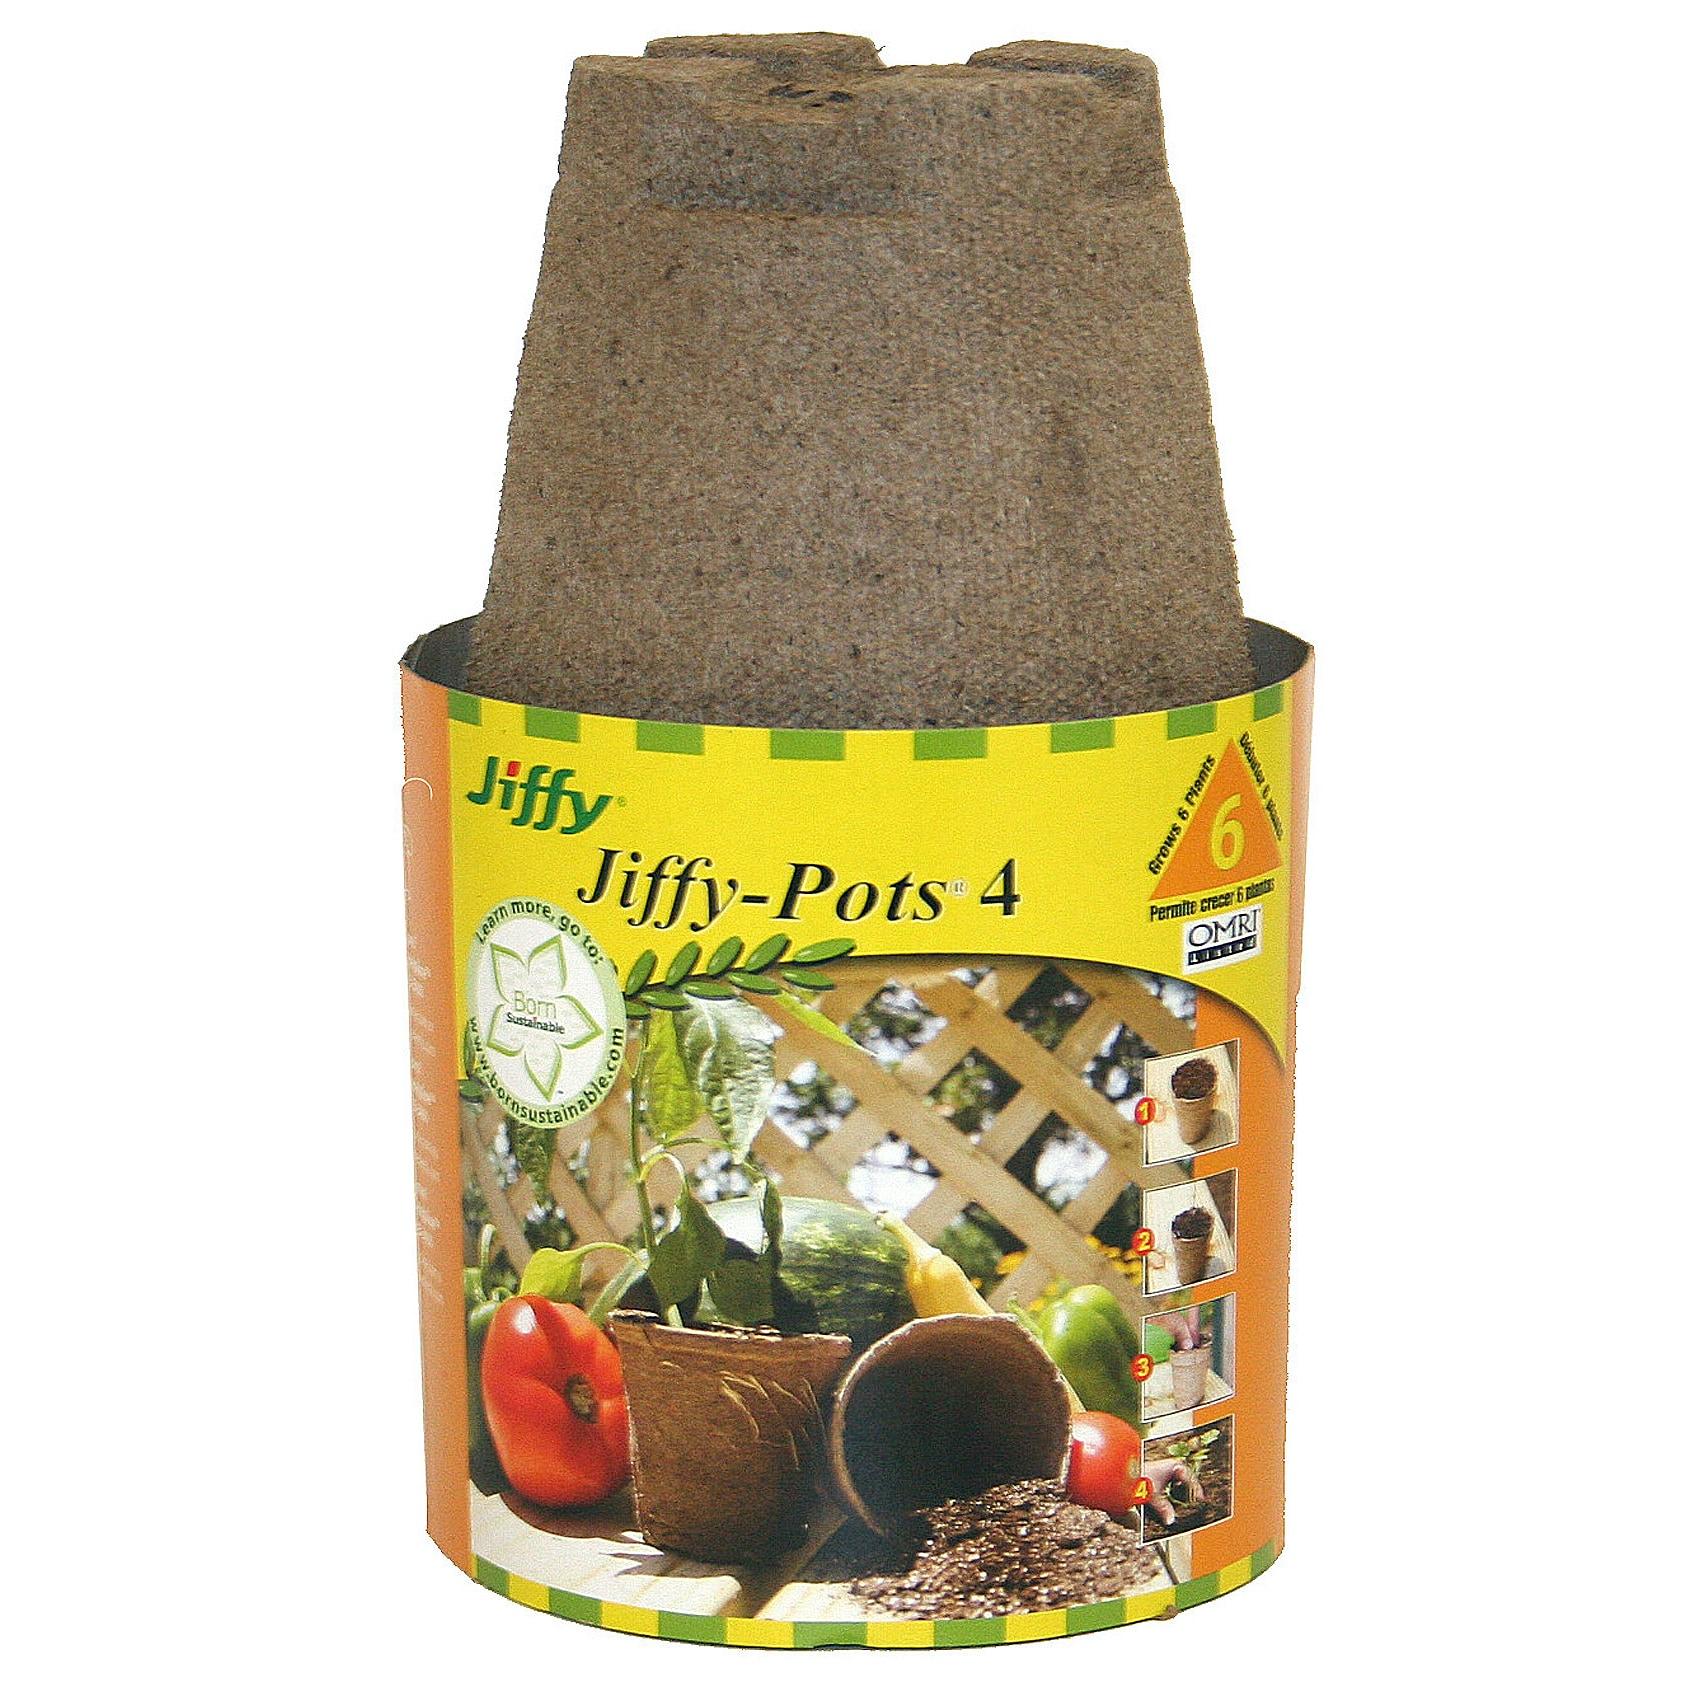 Jiffy JP406 4-inch Round Jiffy Pots (Plant Starters), Bro...